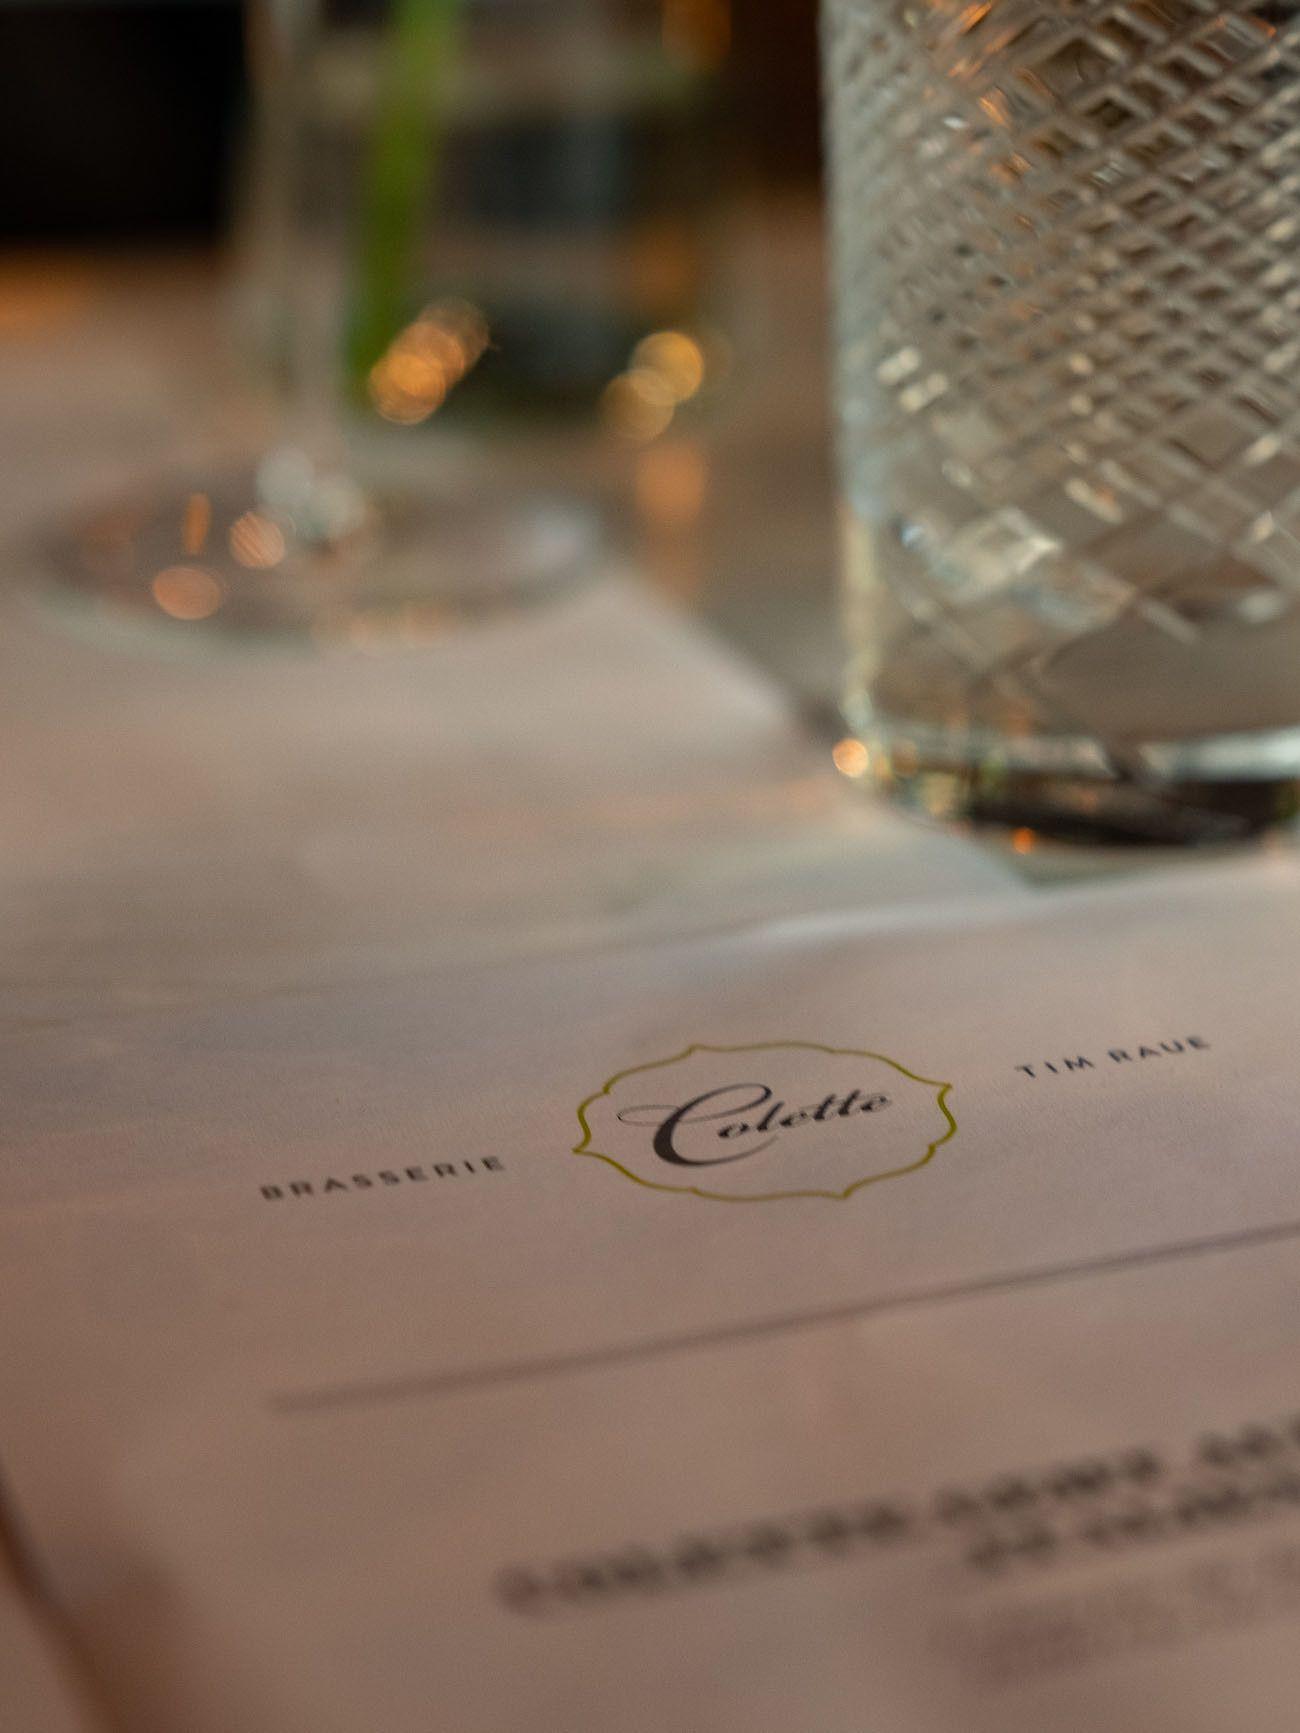 Foodblog, About Fuel, Brasserie Colette Tim Raue, Glas, Menü